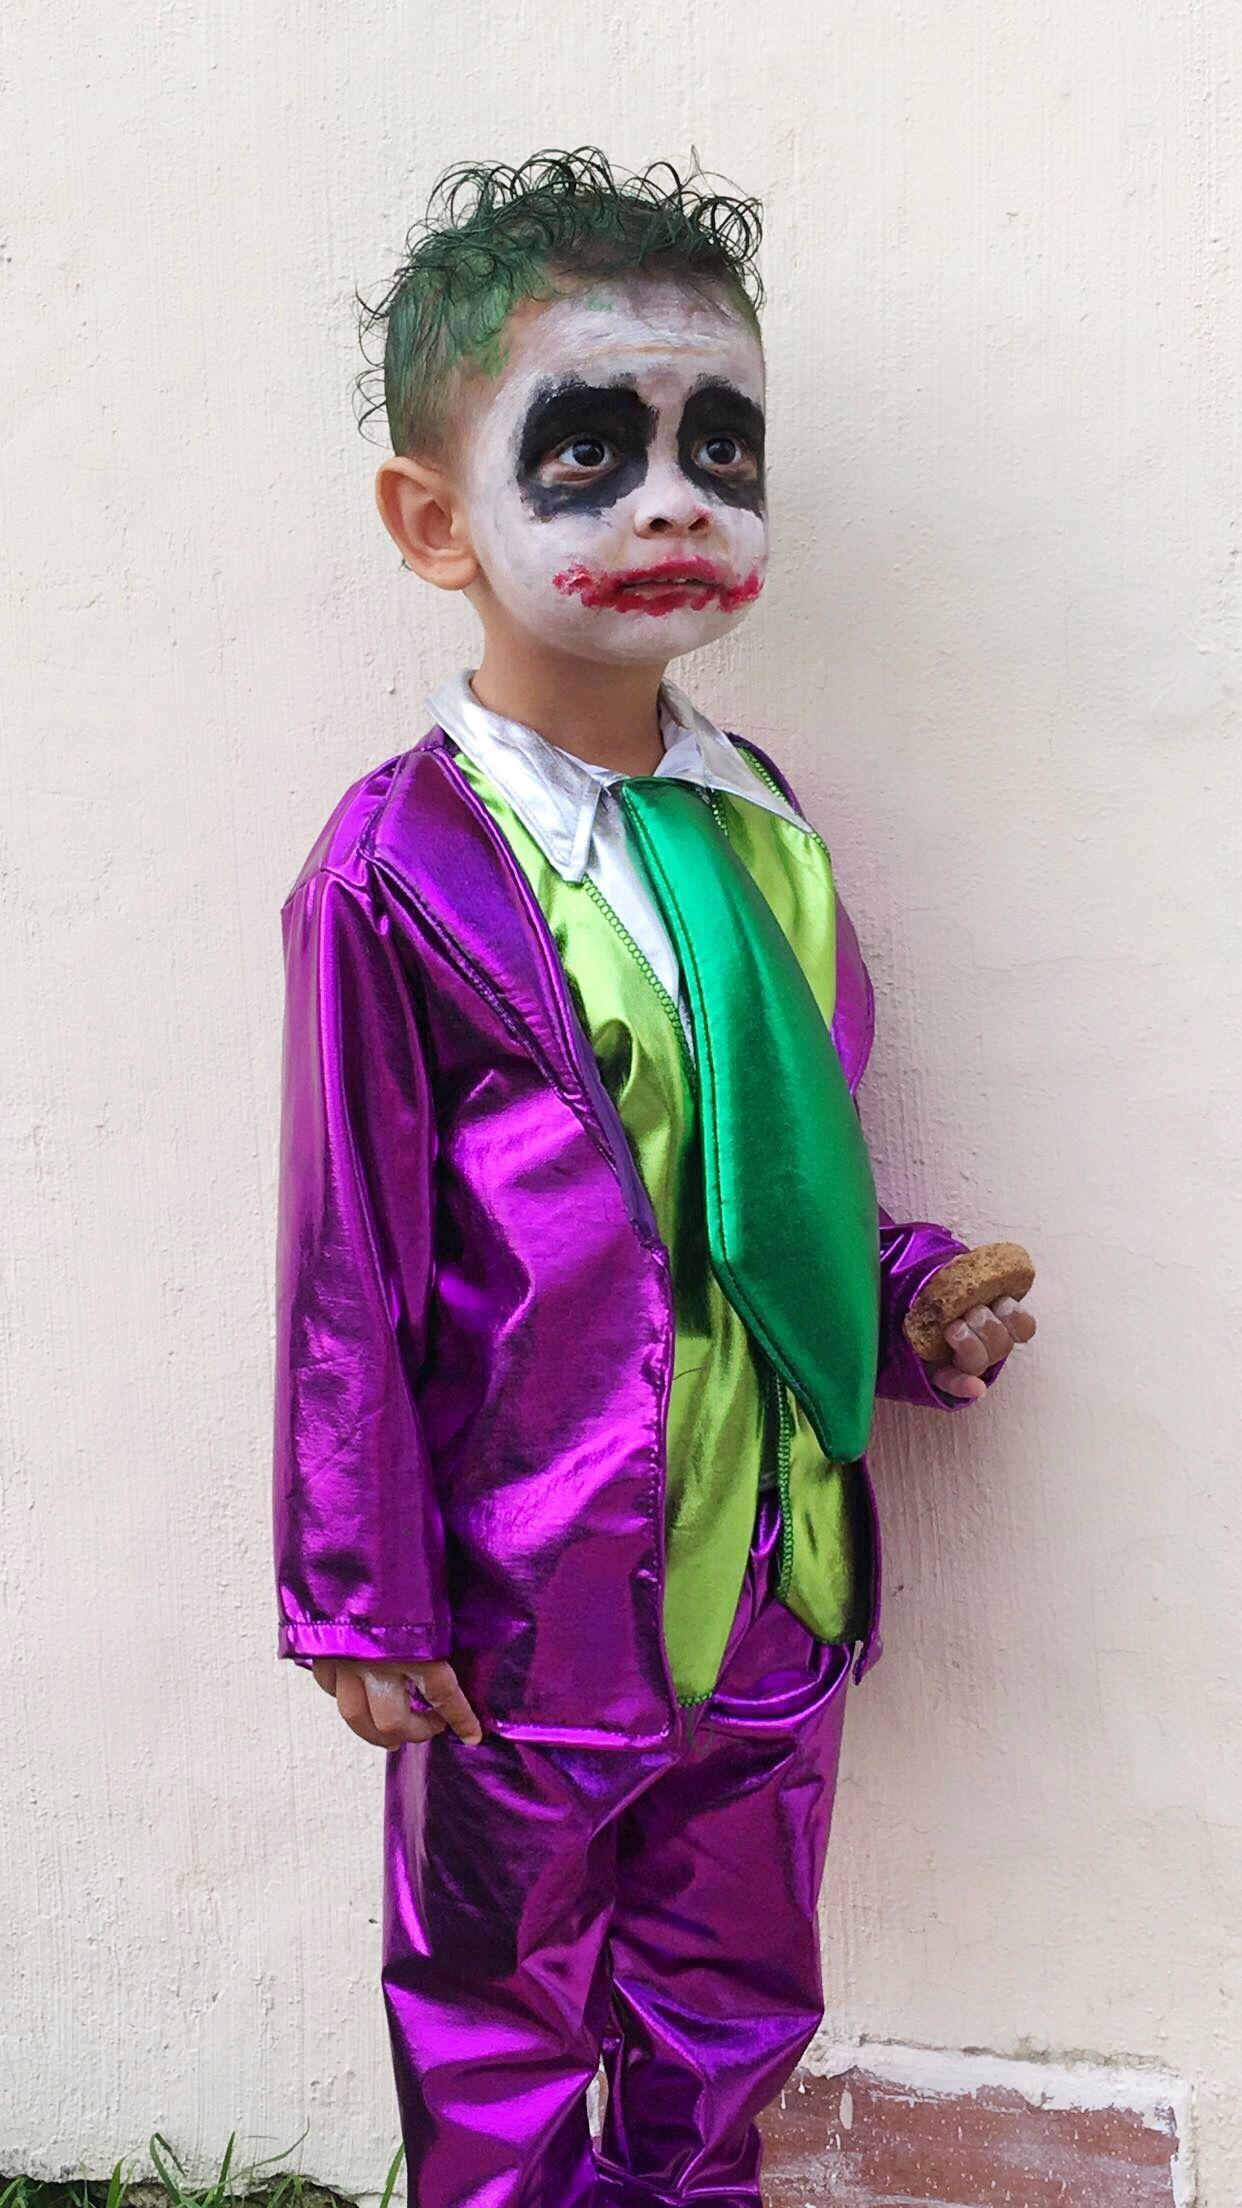 Jocker costume / disfraz de Guason infantil (con imágenes